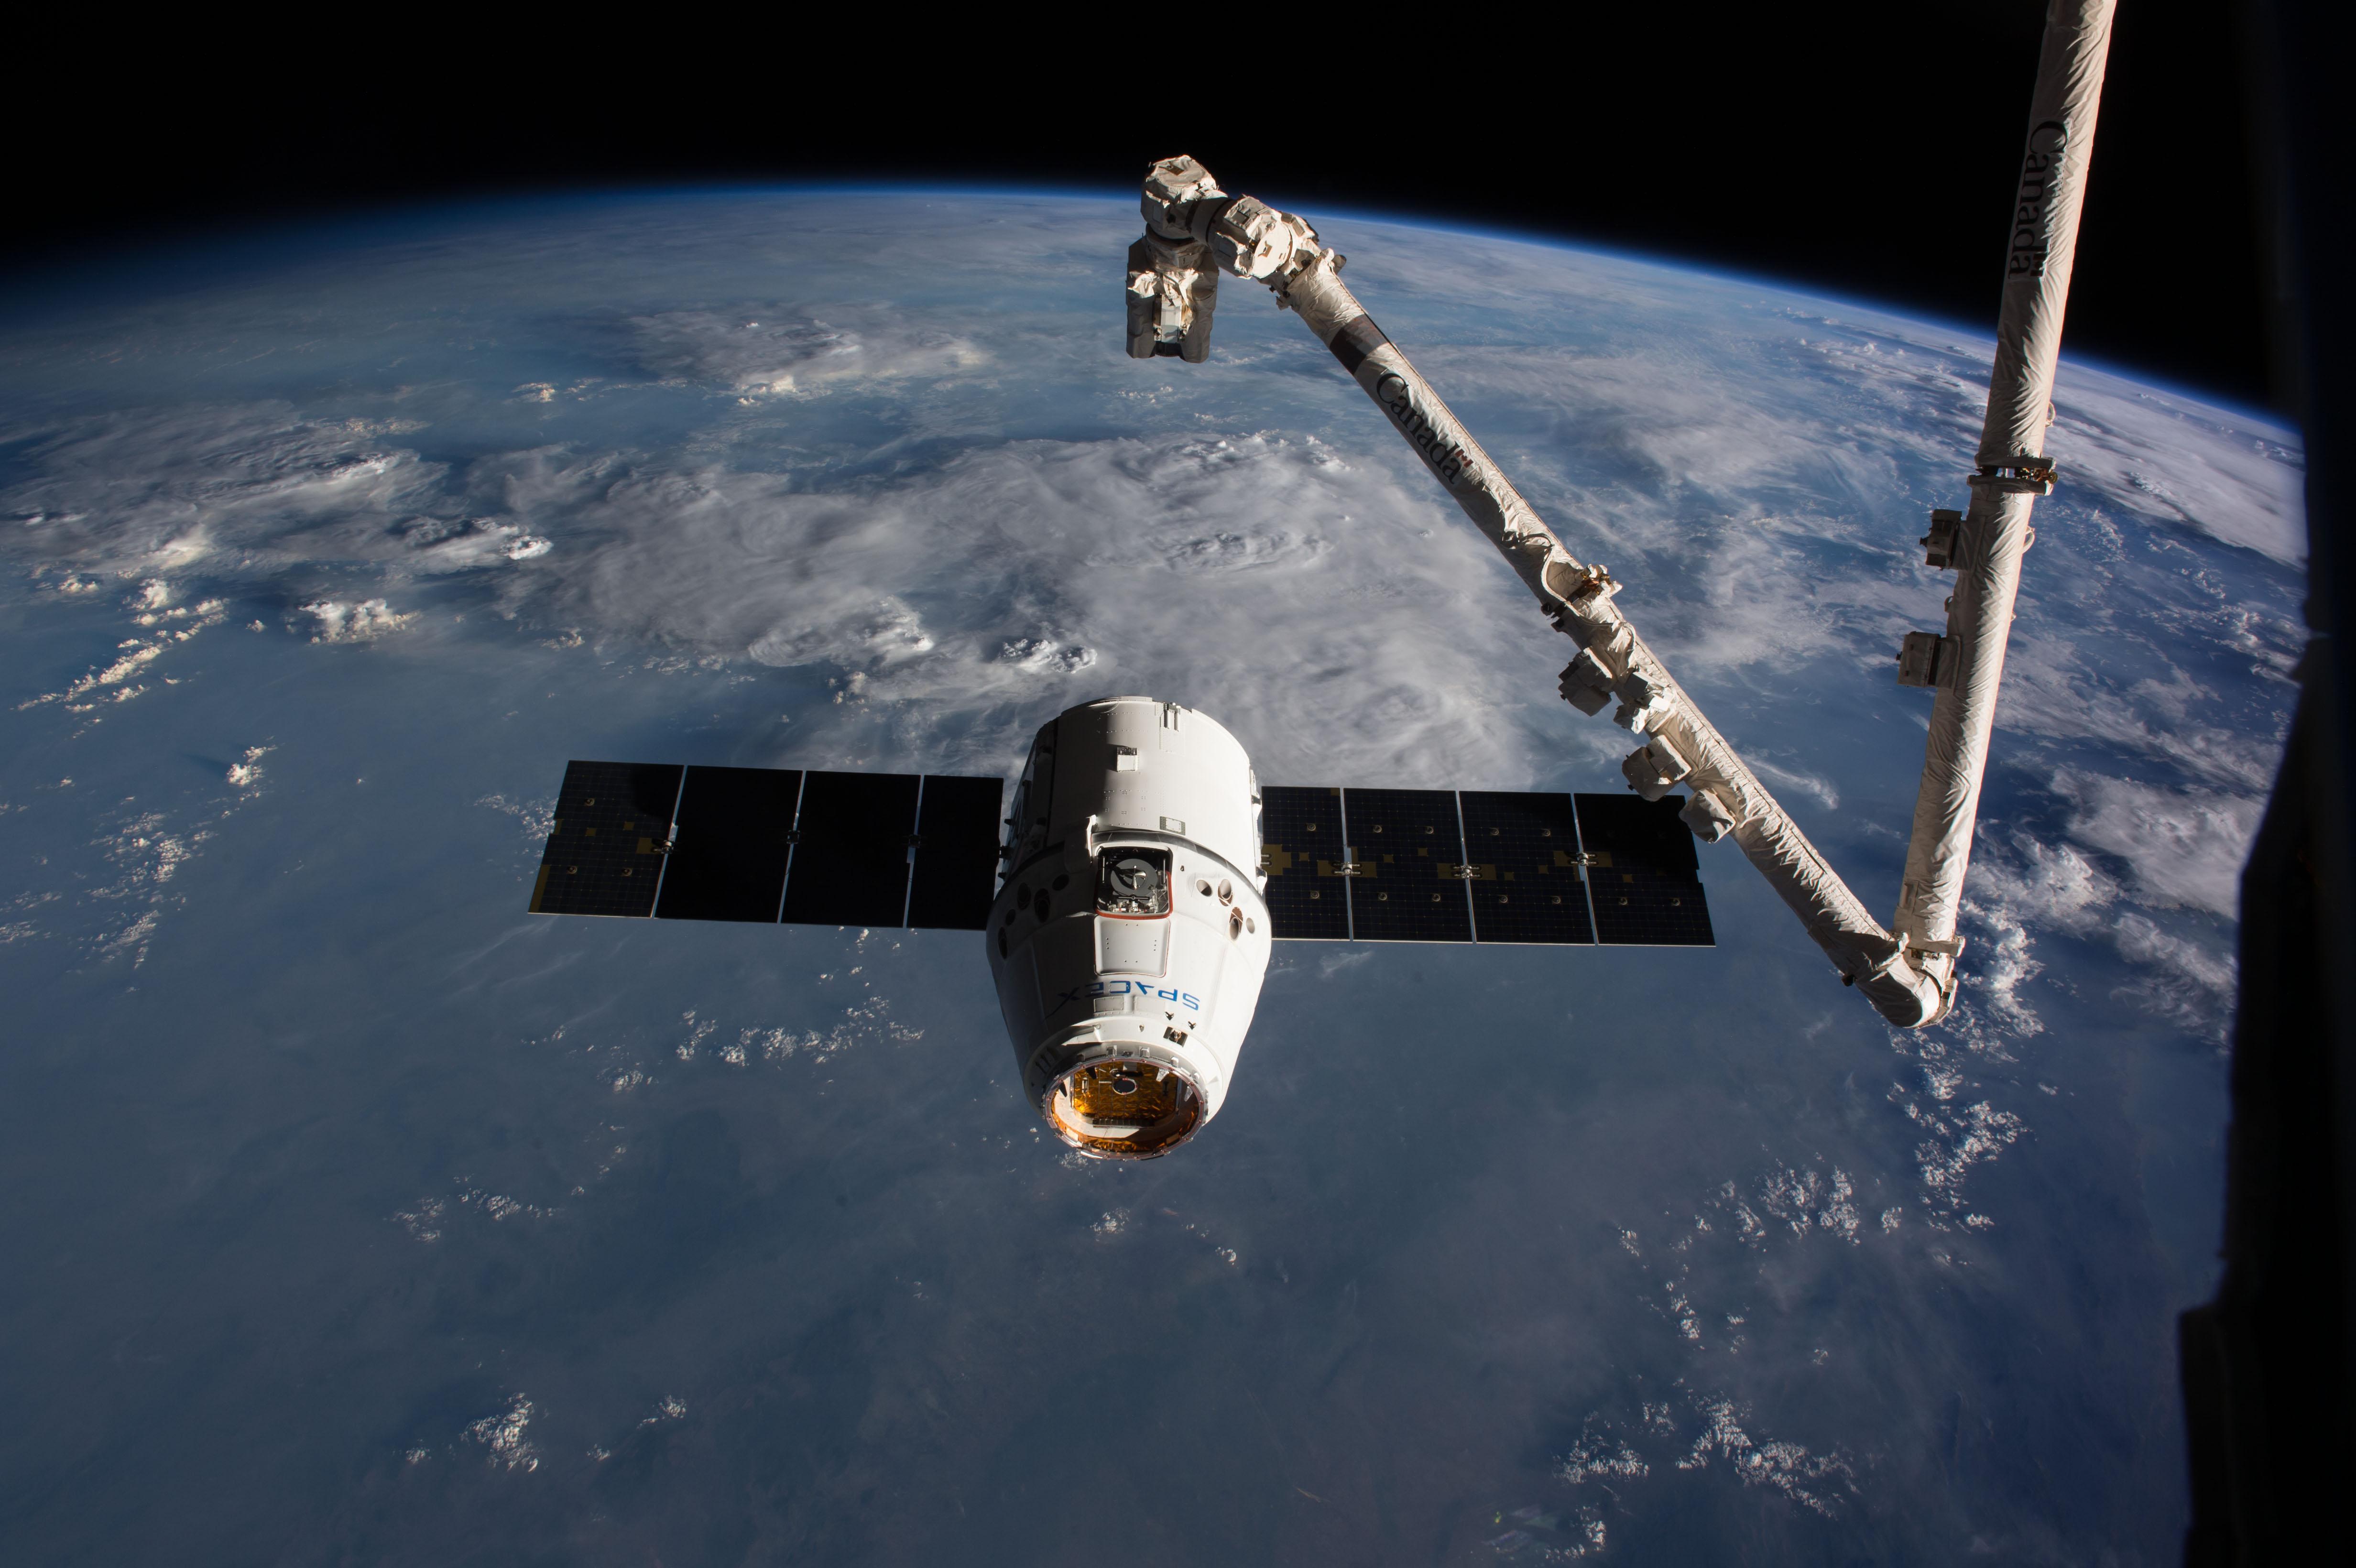 us nasa space station - photo #12